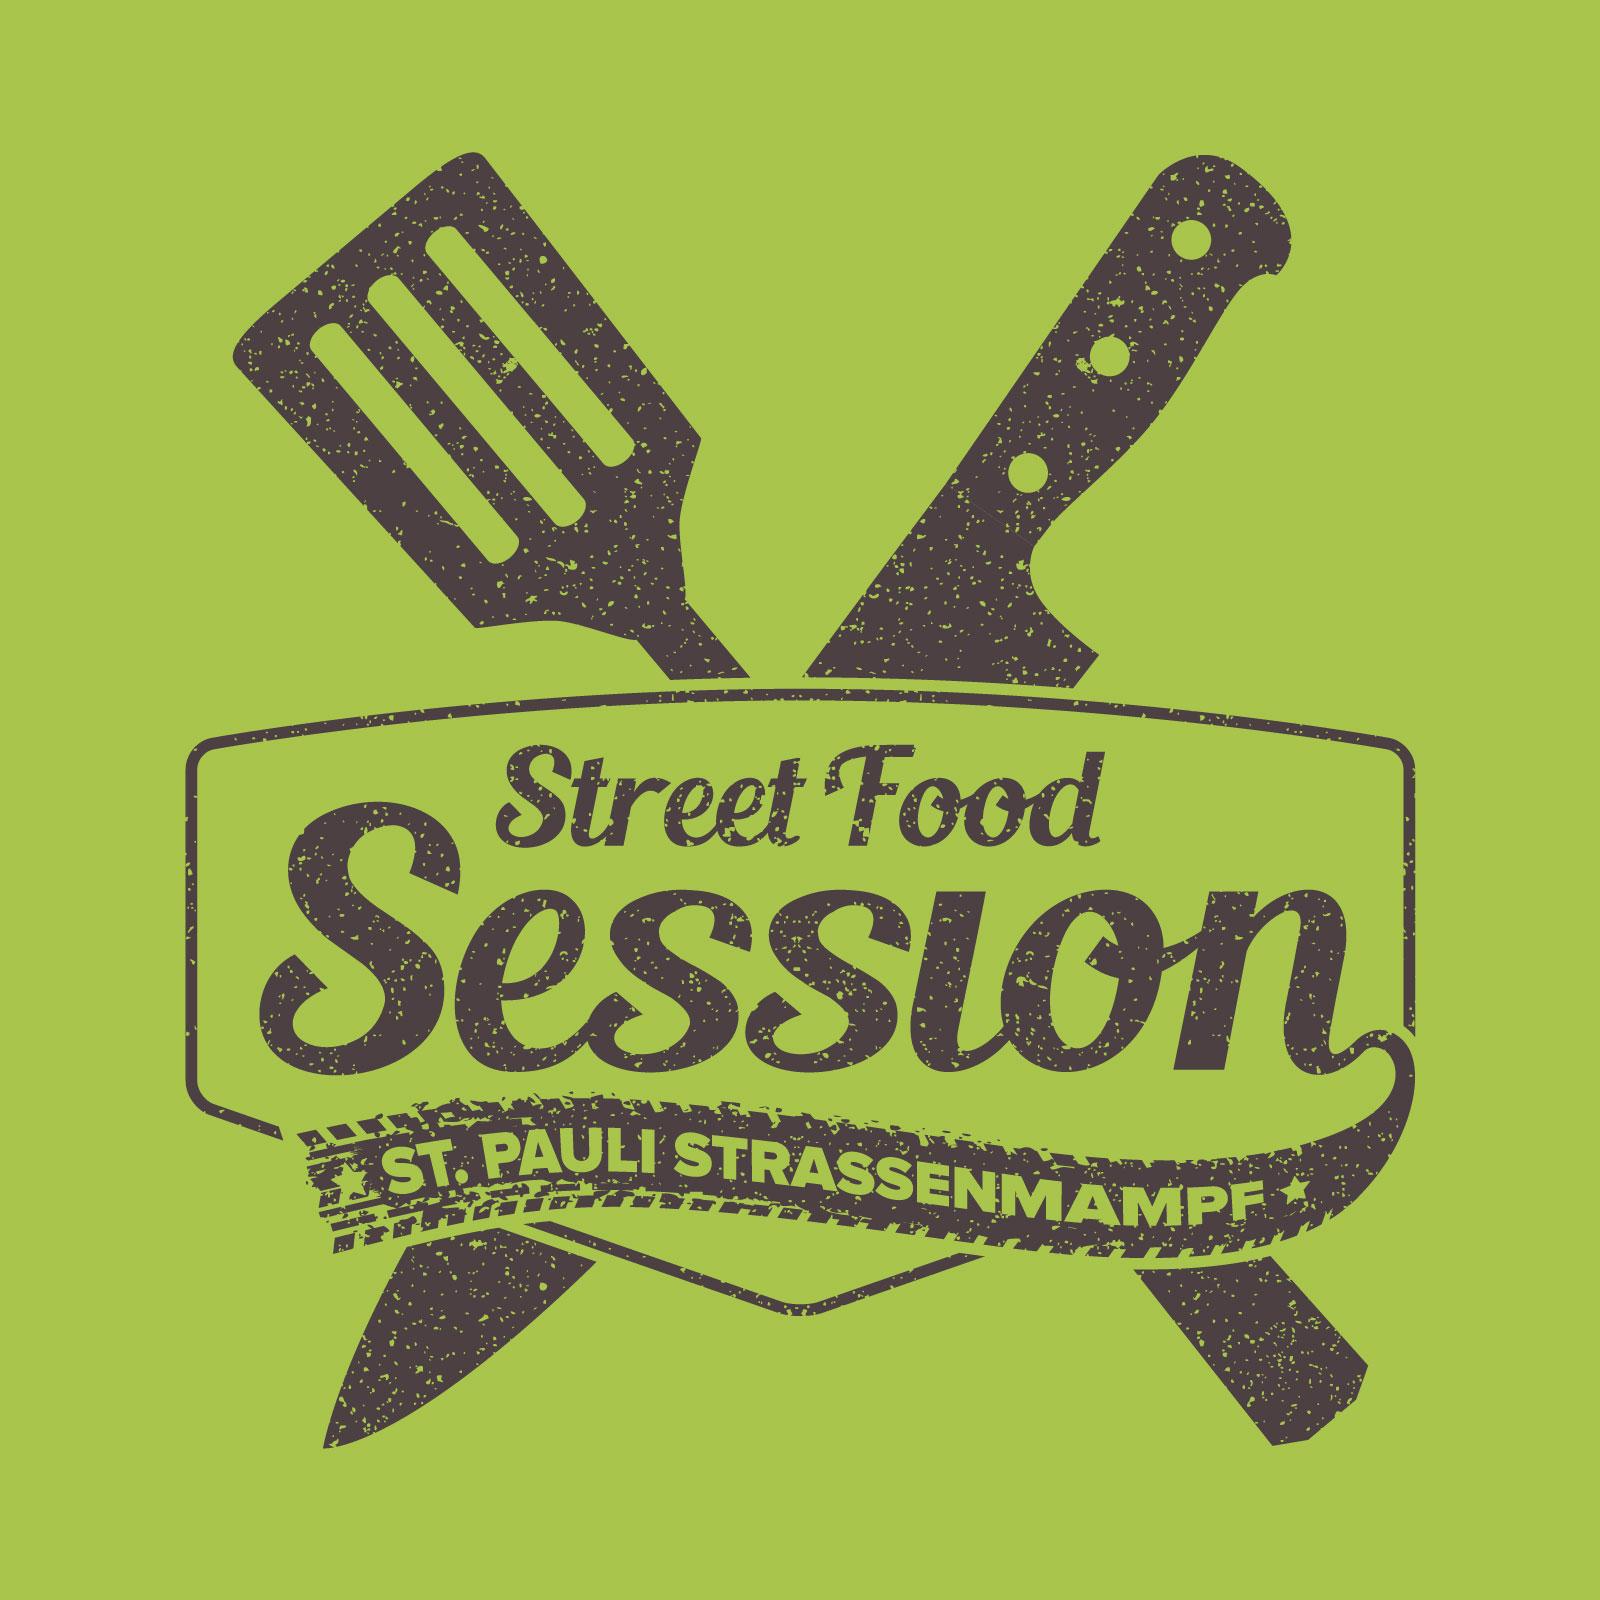 street food session st pauli stra enmampf spielbudenplatz hamburg st pauli. Black Bedroom Furniture Sets. Home Design Ideas